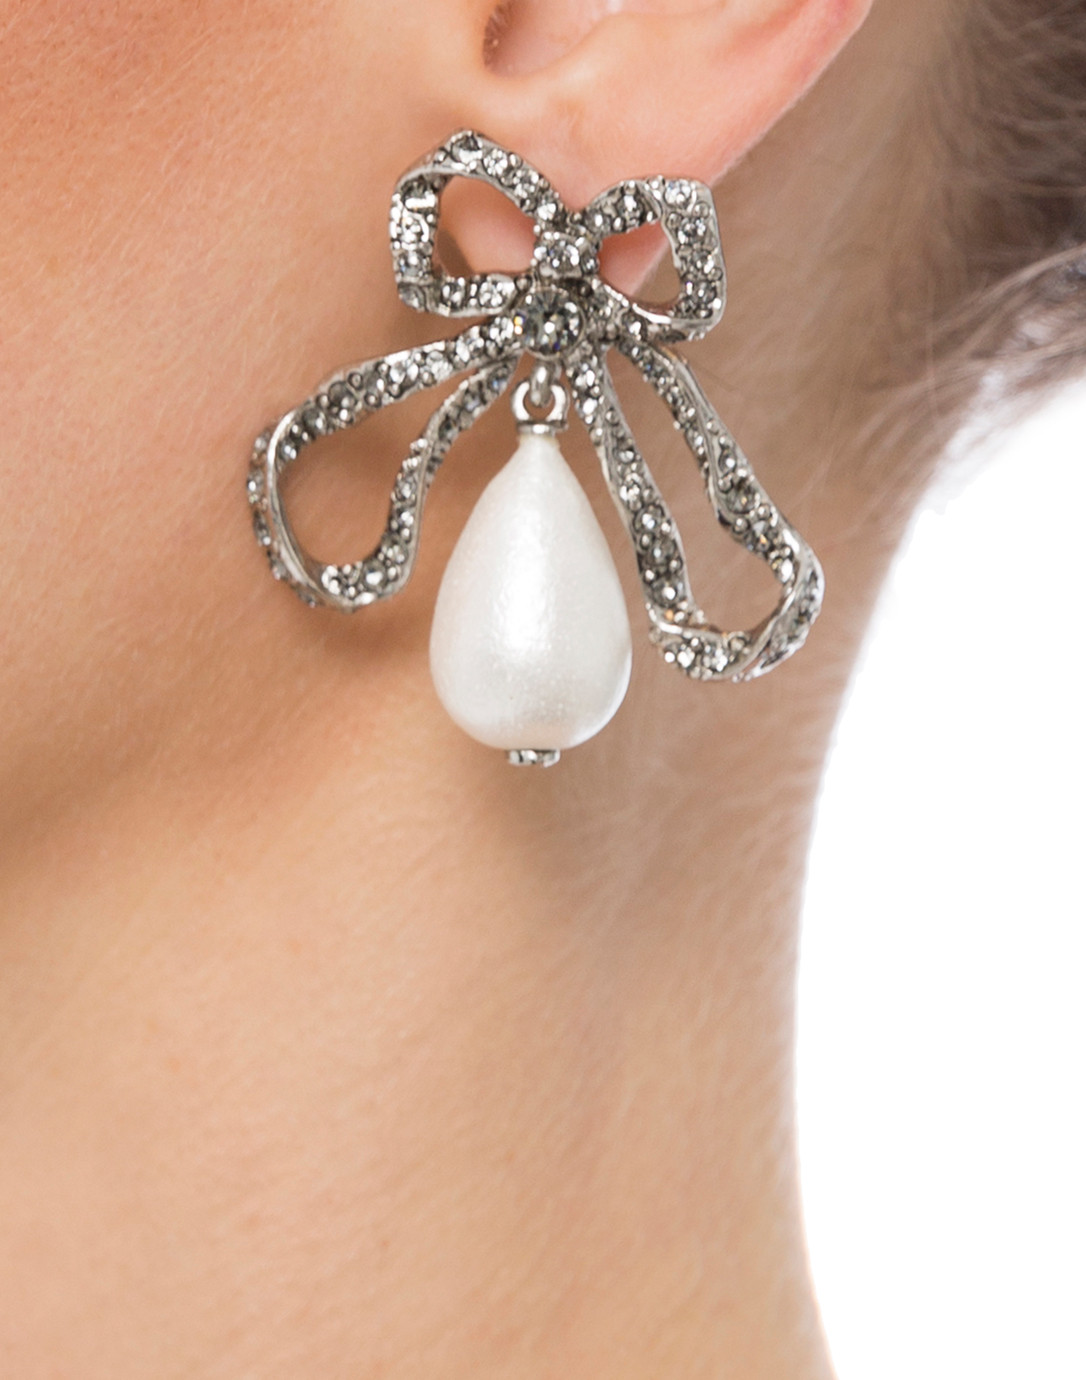 bf2e06cb5 Pearl Drop Bow Earrings | Oscar de la Renta | Halsbrook